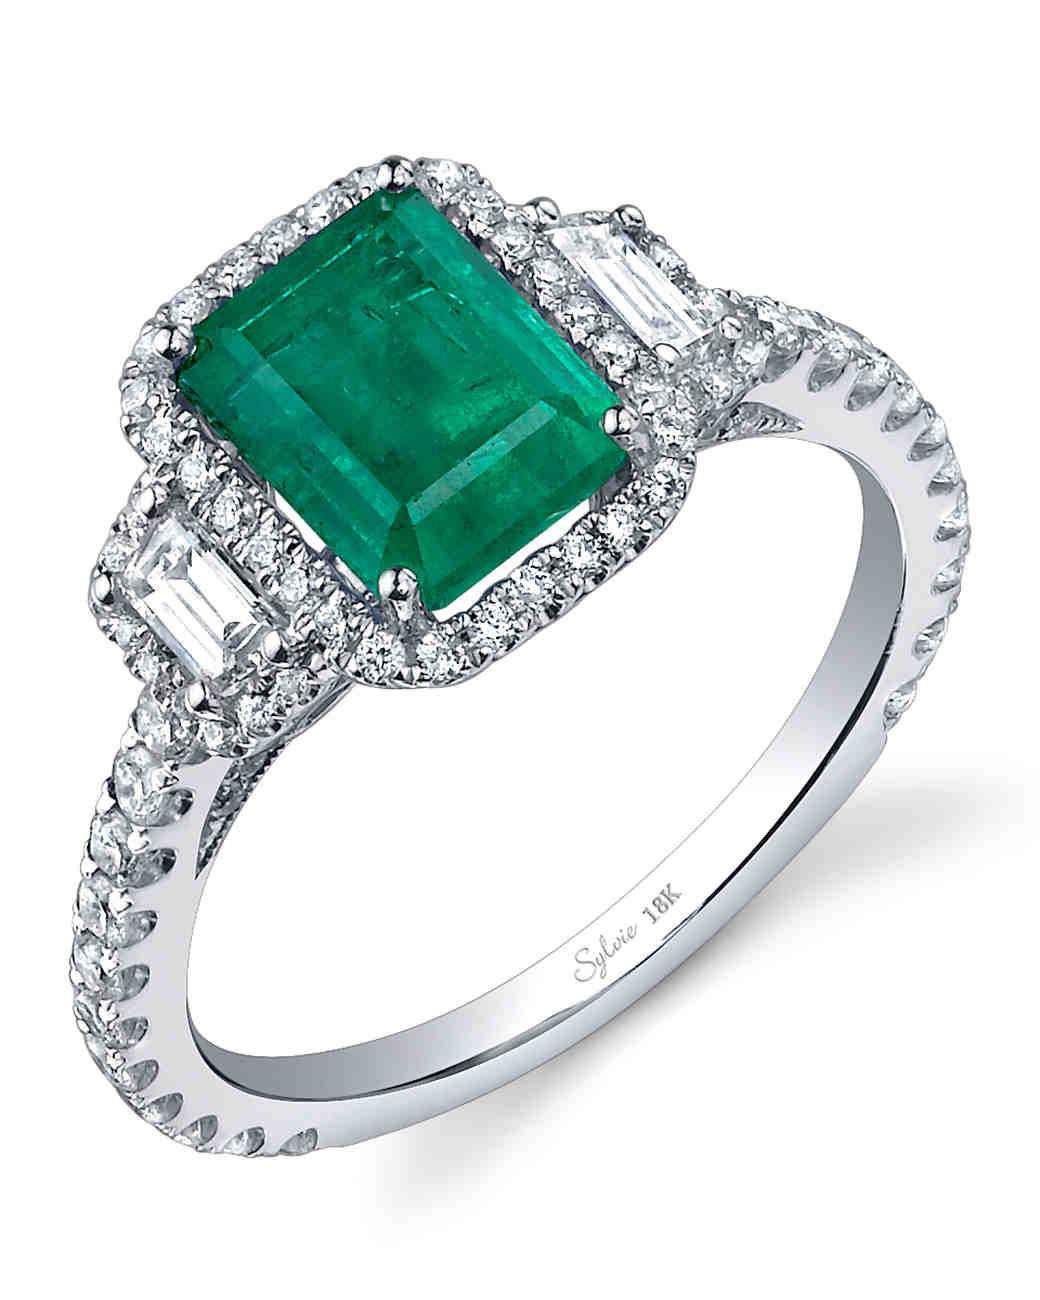 Slyvie Collection Emerald Engagement Ring: Green Lantern Emerald Wedding Band Set At Websimilar.org